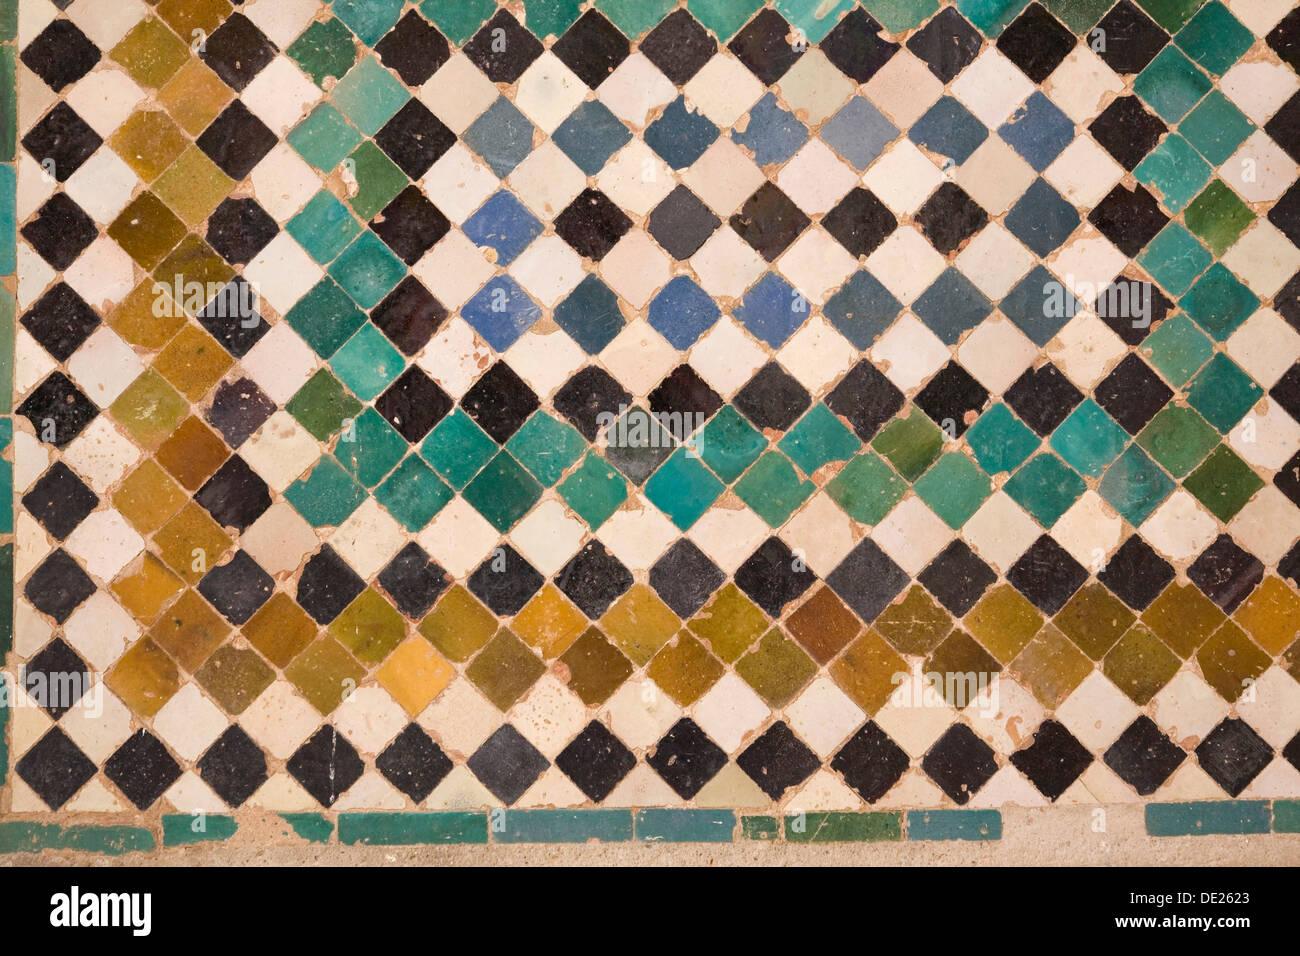 Ceramic Tile Mosaic Stock Photos Ceramic Tile Mosaic Stock Images